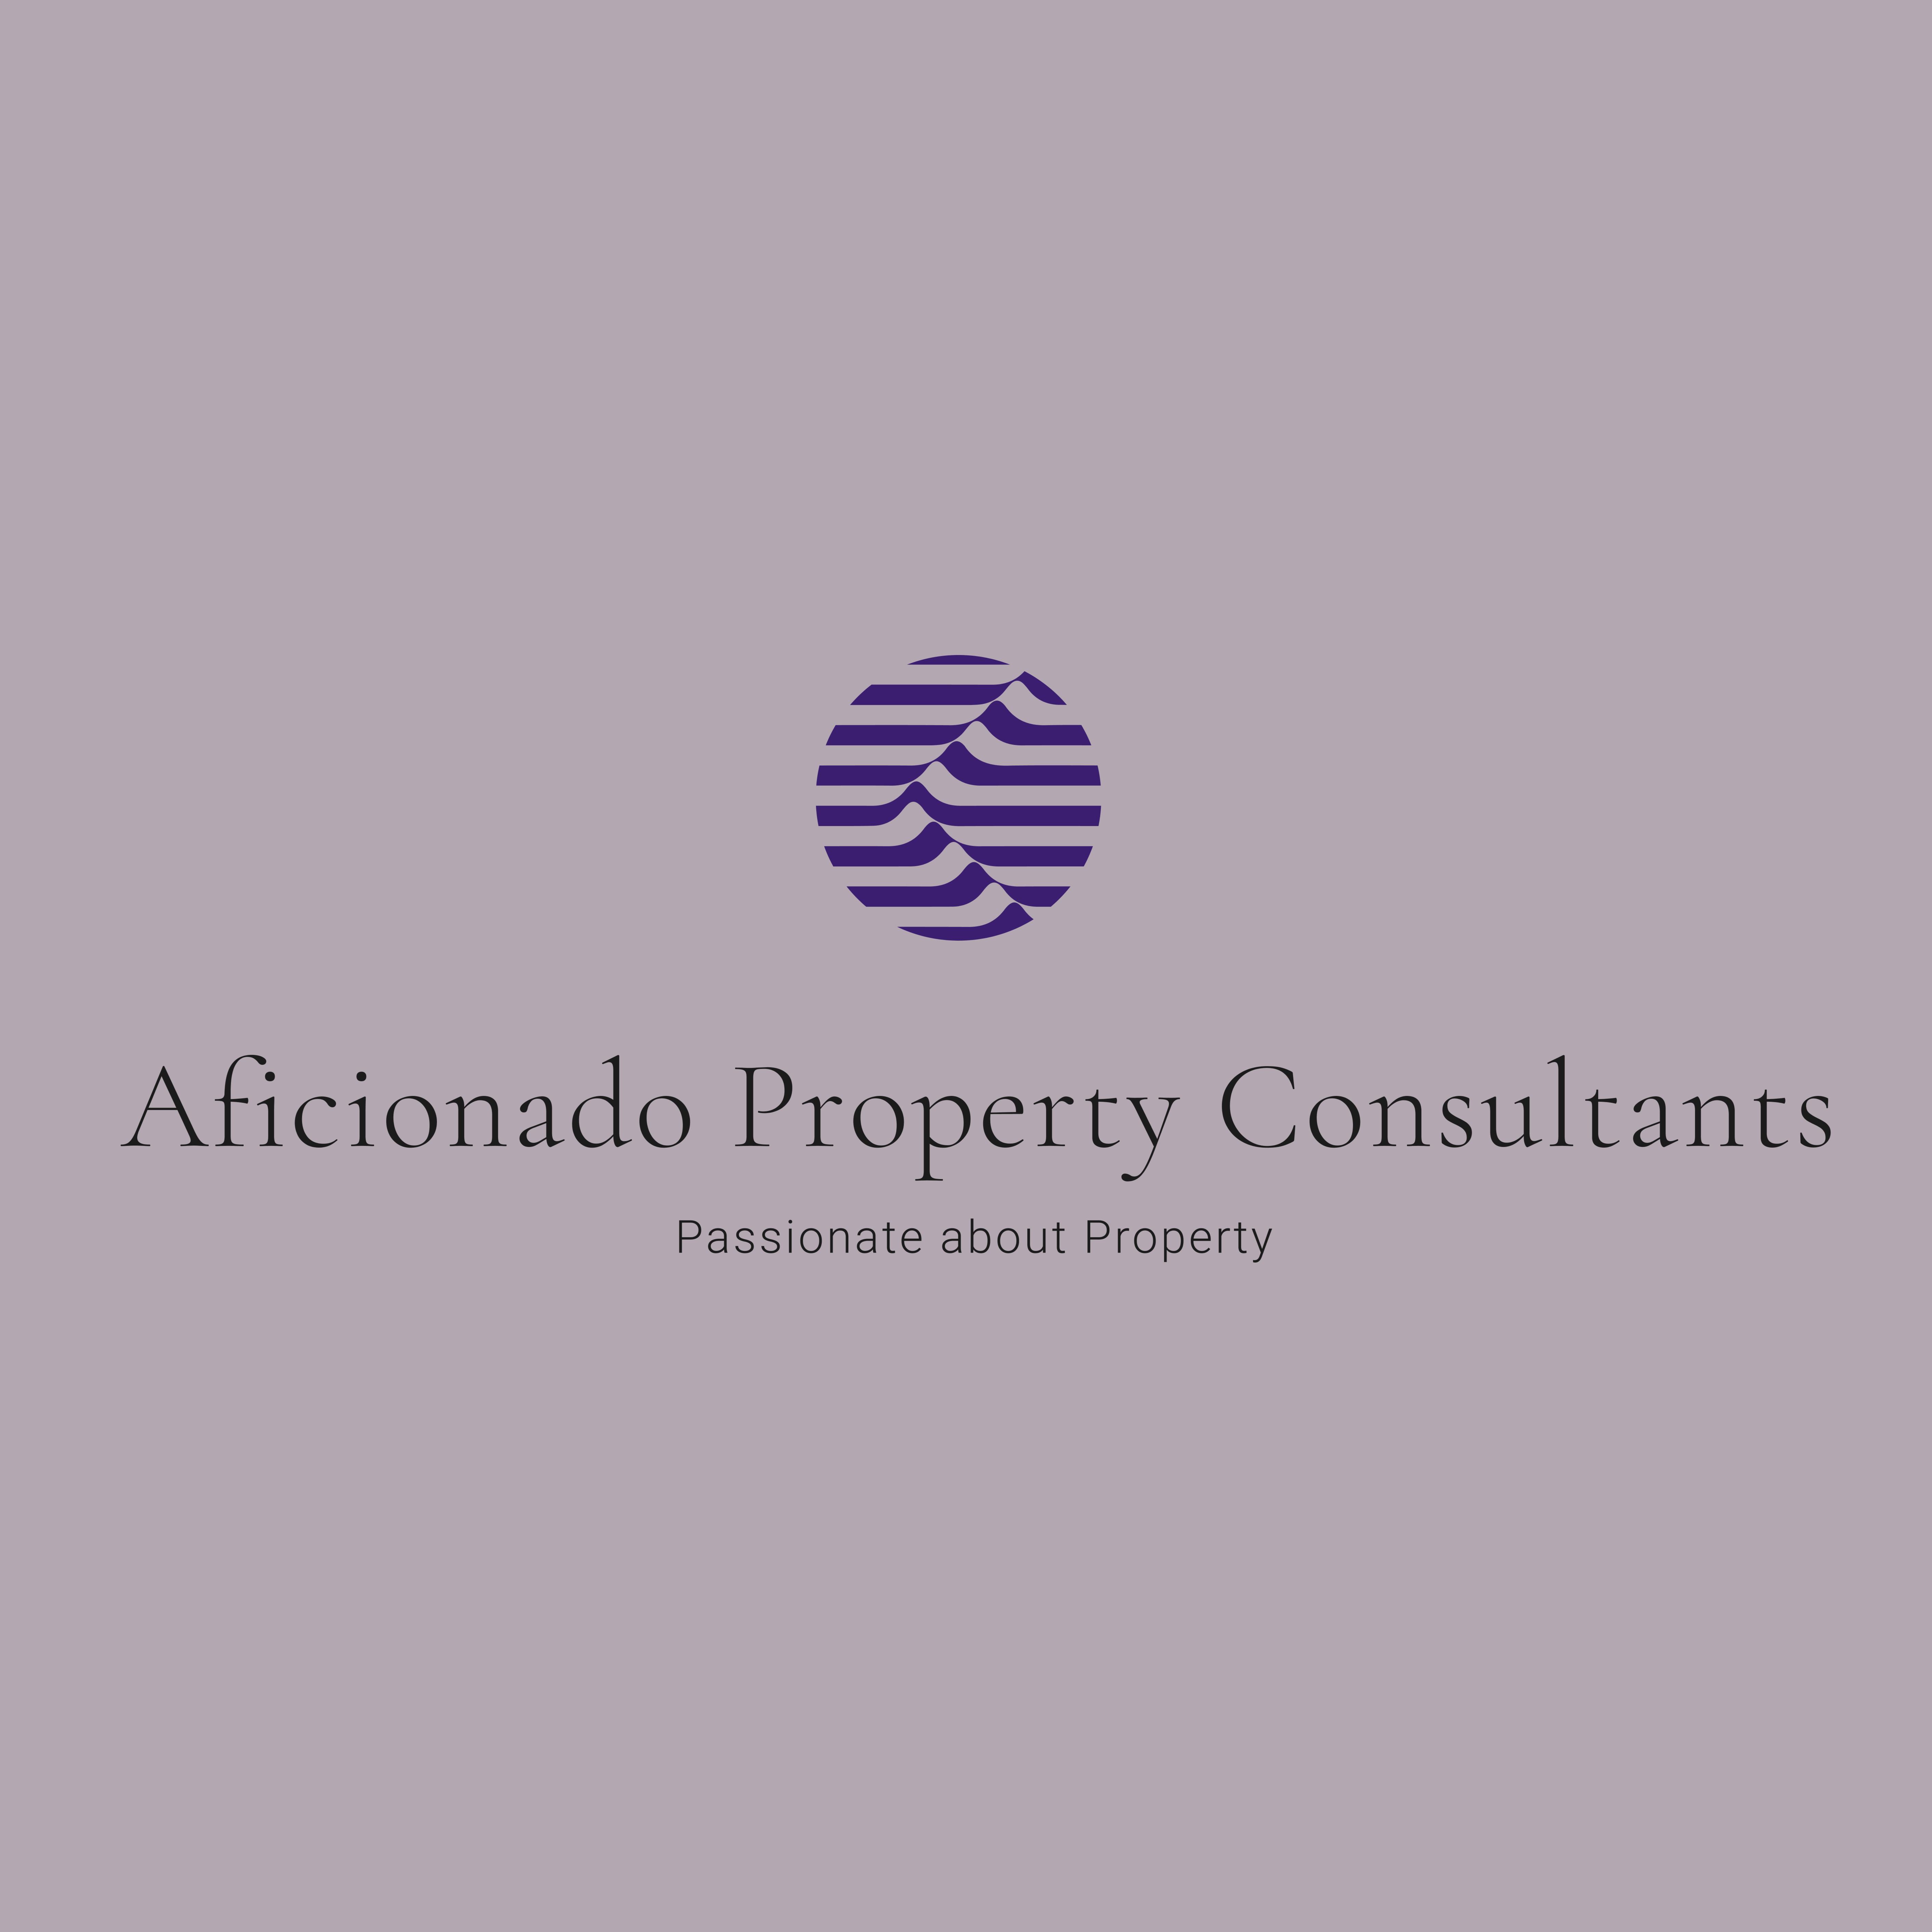 Aficionado Property Consultants | Bolney RH17 5QT | +44 7970 773847